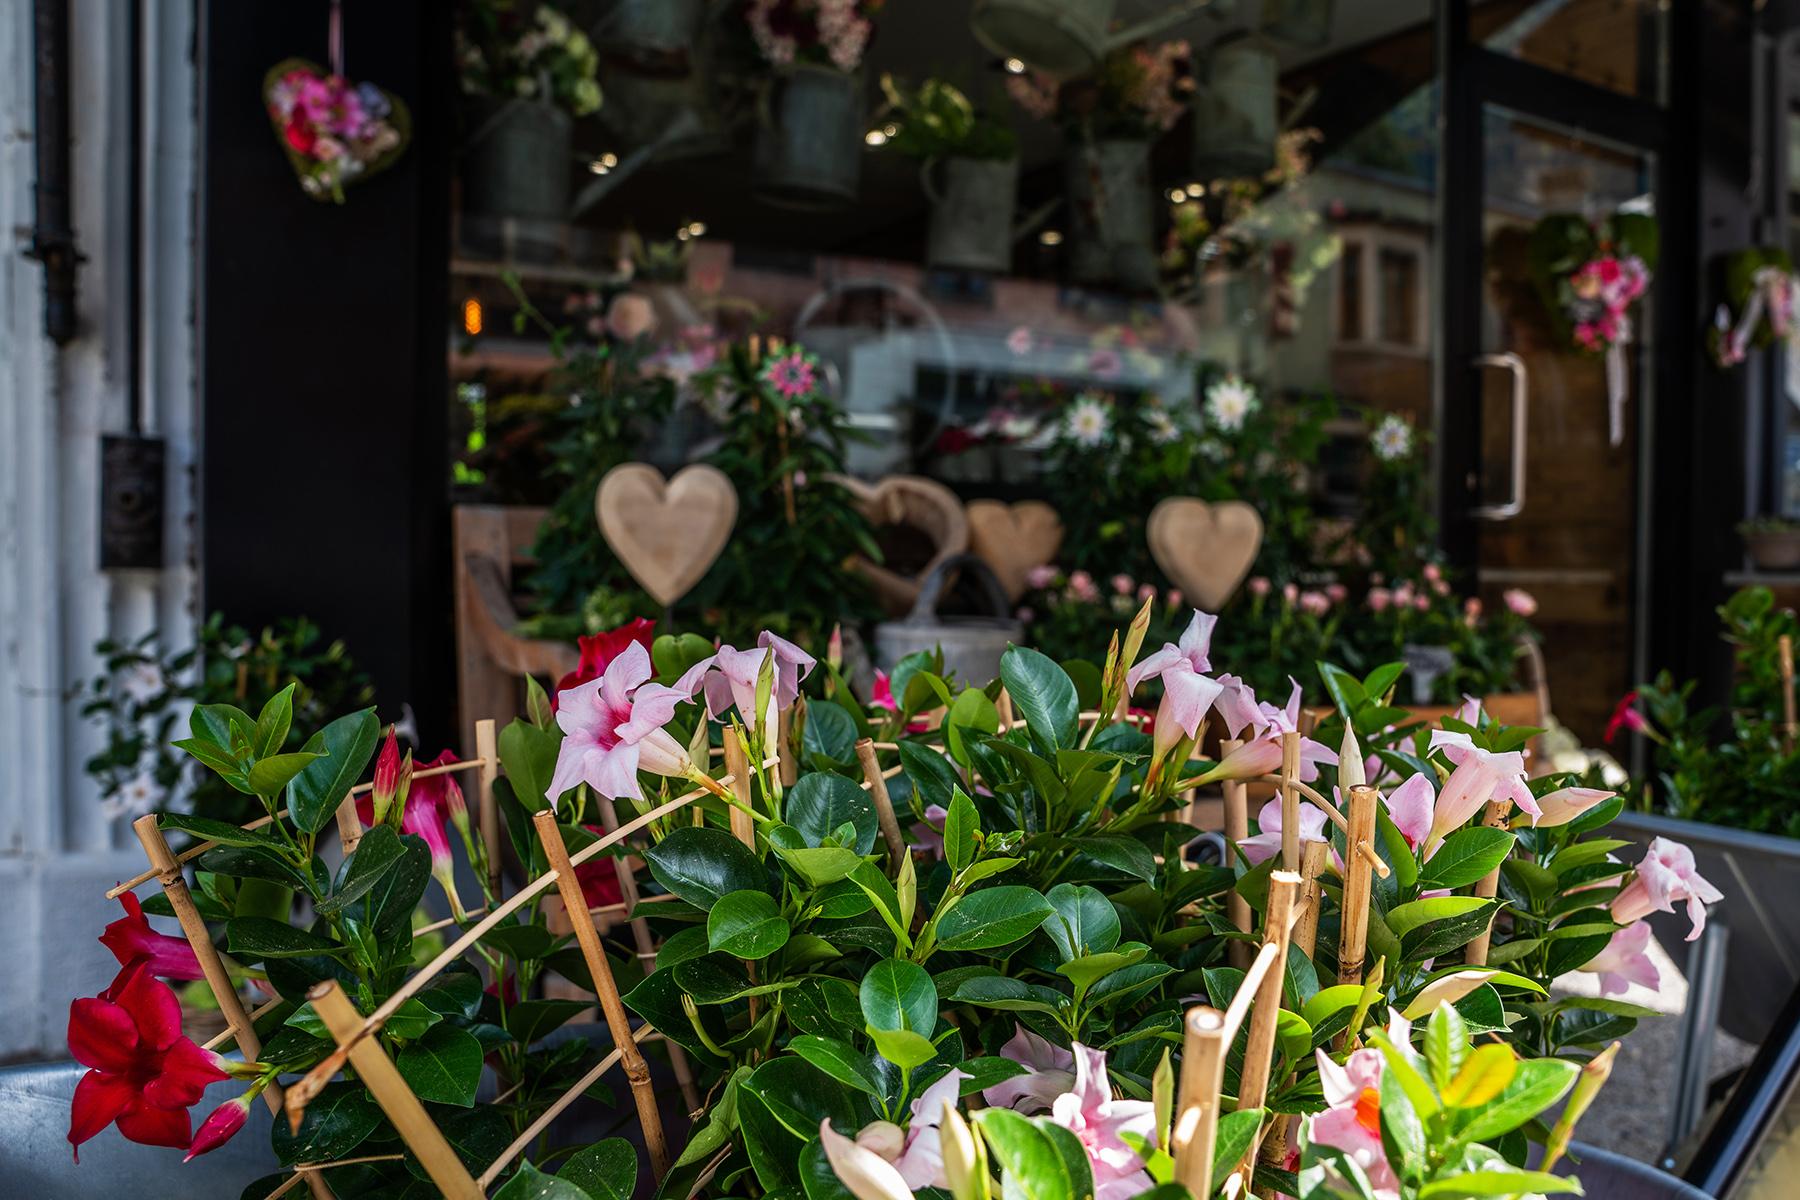 Flower shop in Amsterdam